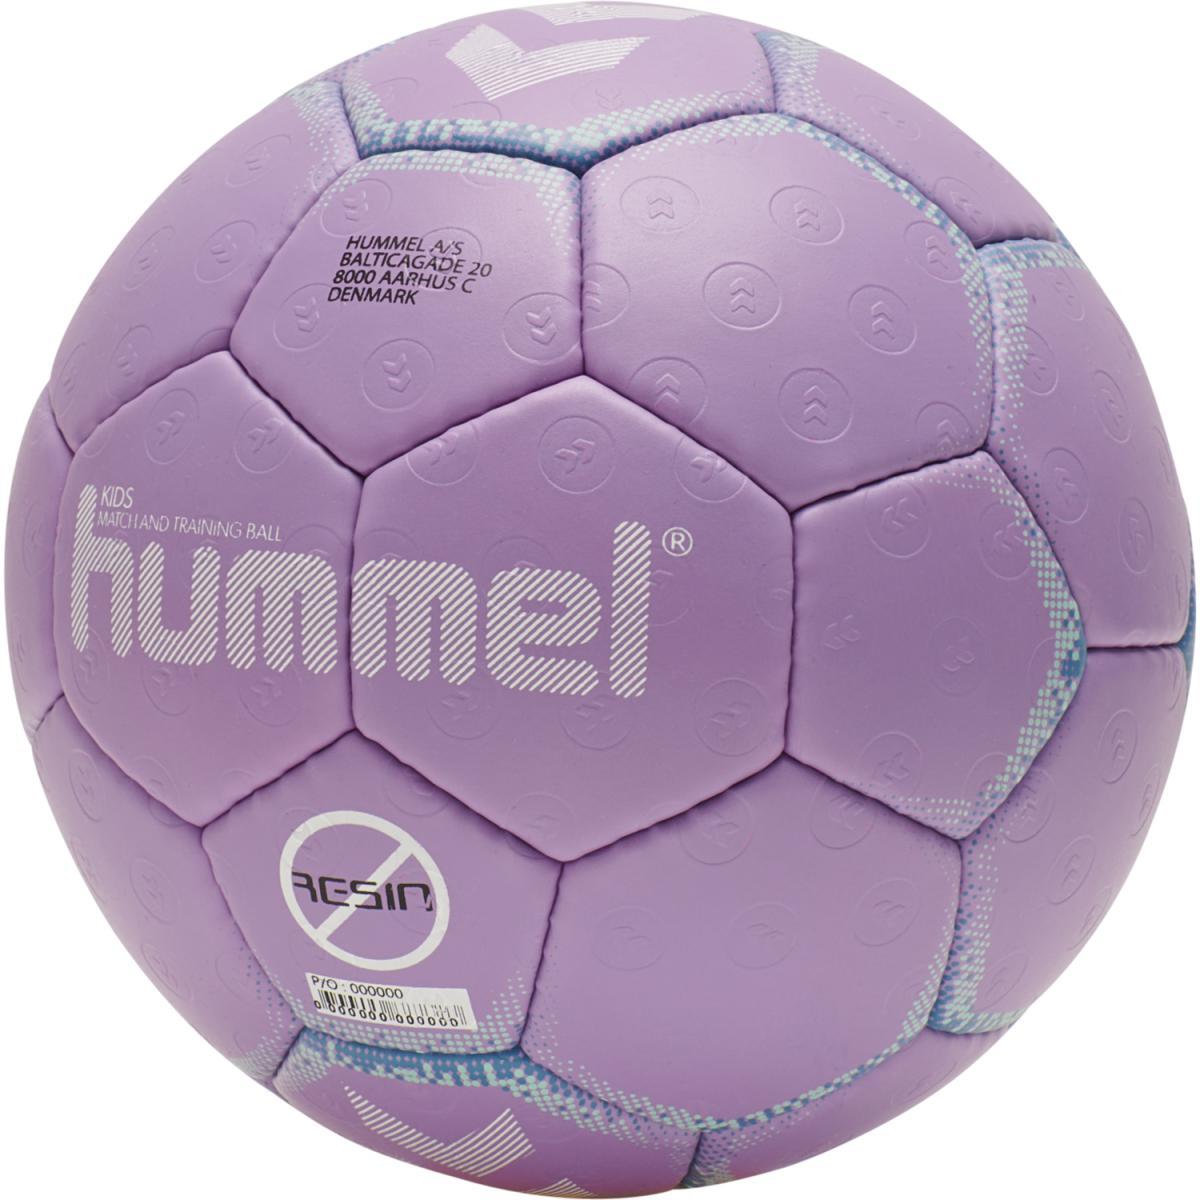 Hummel  Kids Hb, håndball